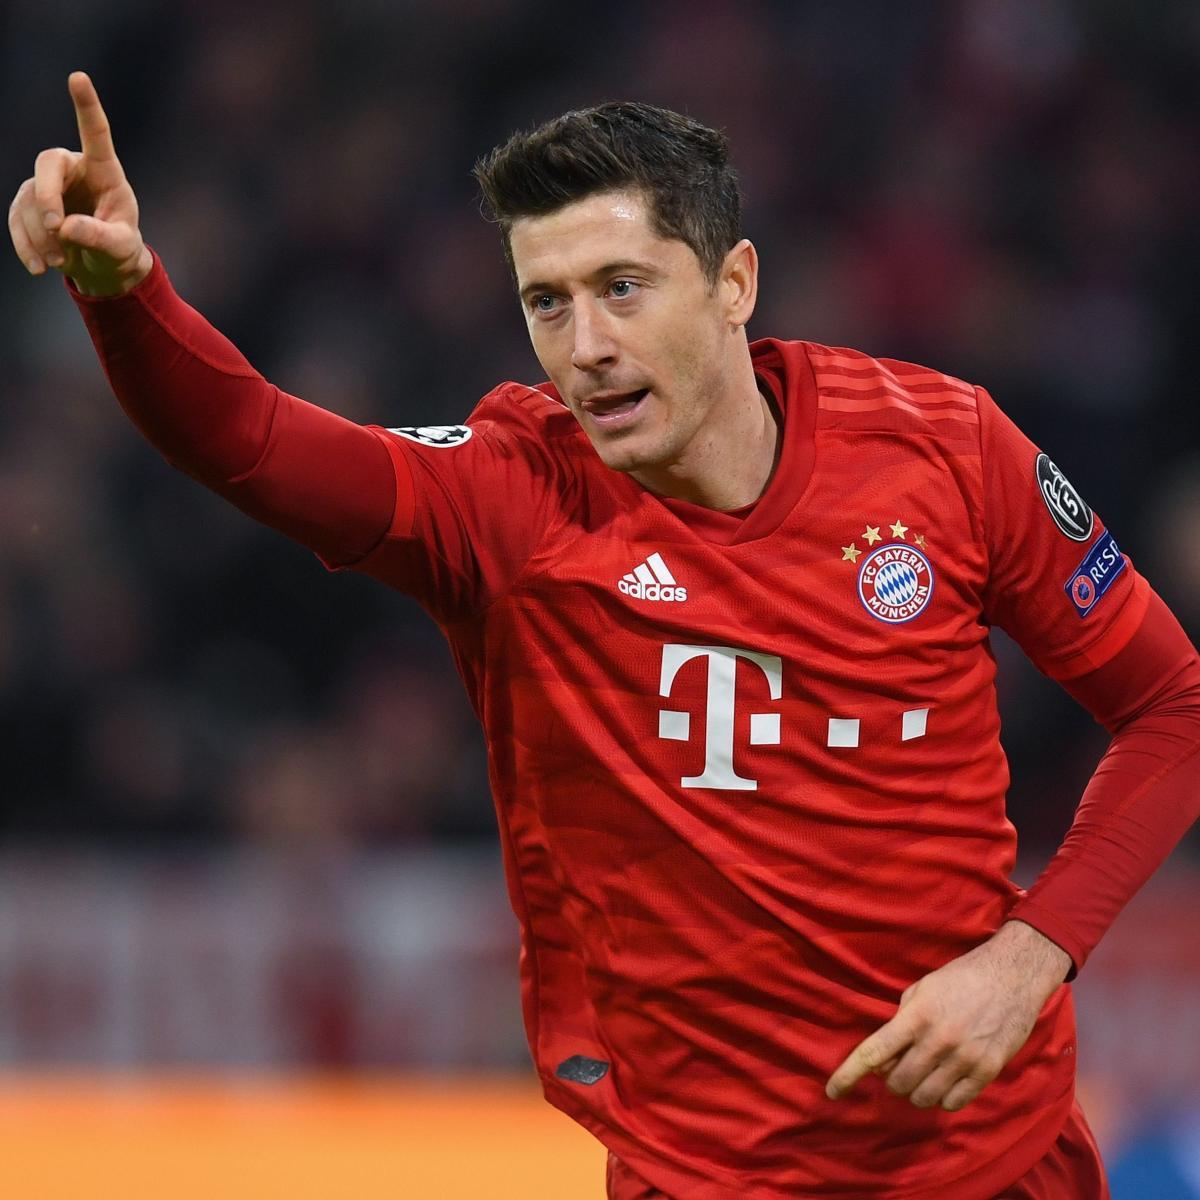 Champions League Qualifiers 2019: Champions League Results 2019: Latest Tables, Top Scorers